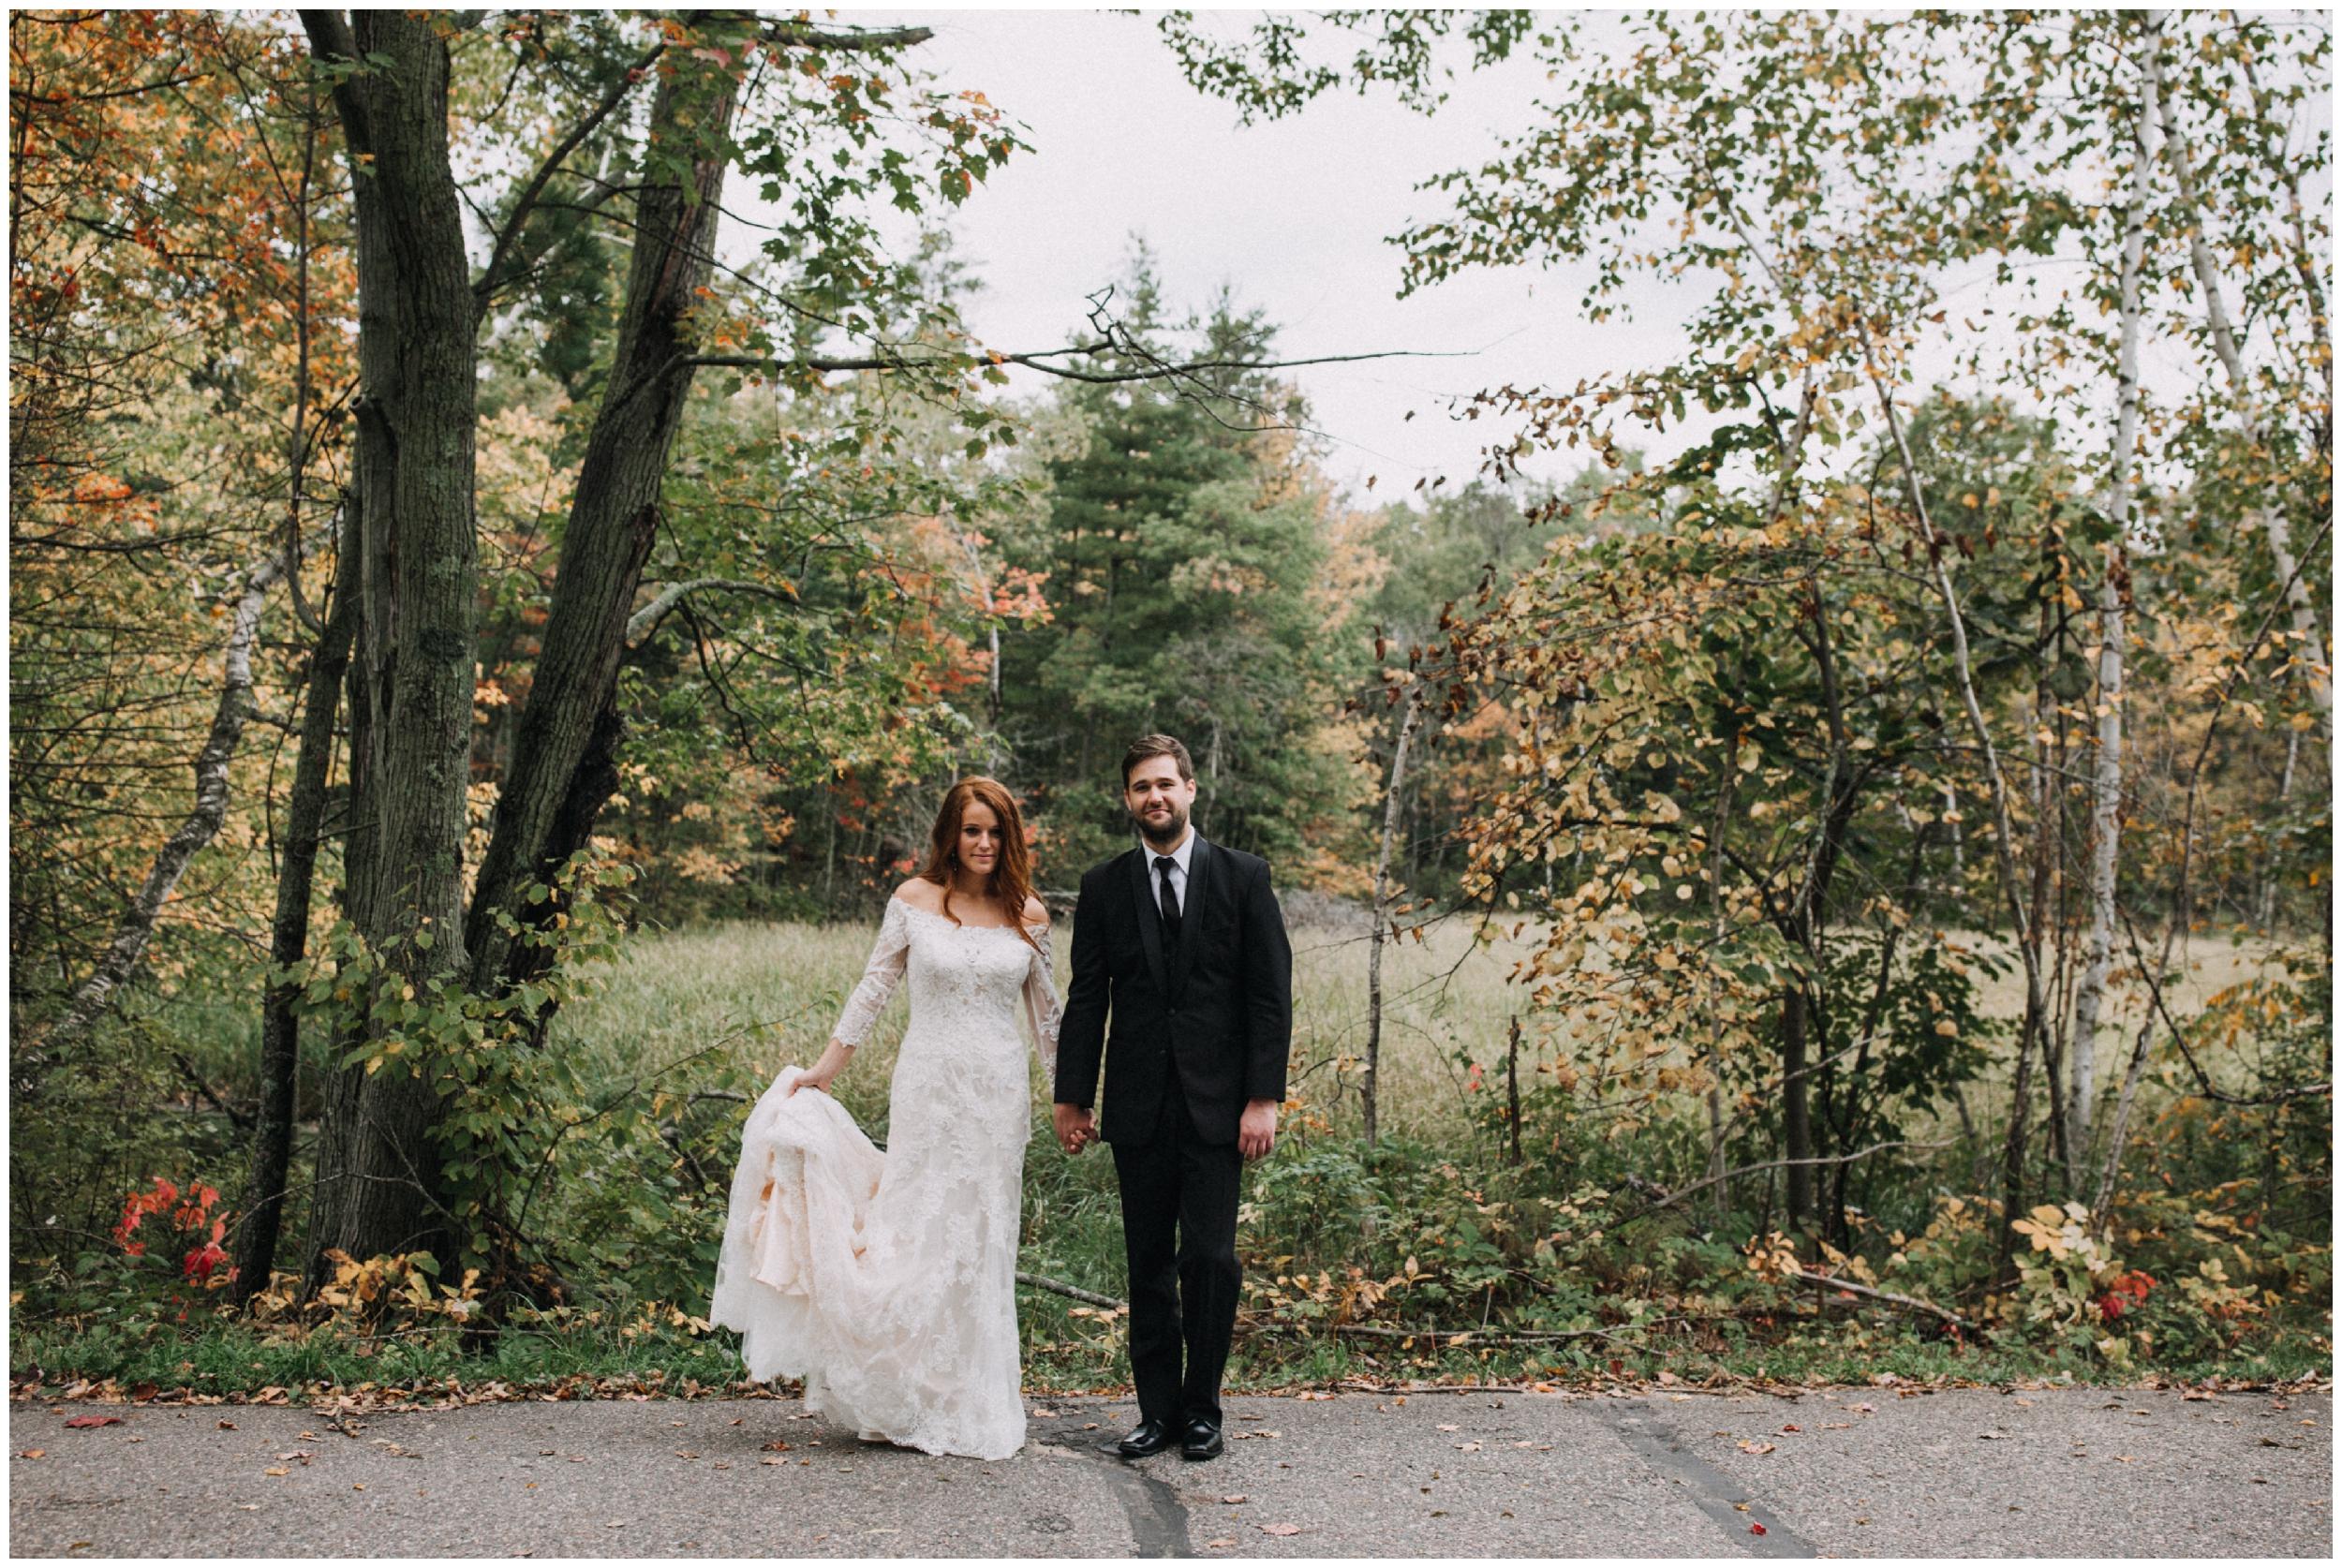 Minnesota fall wedding at cabin on Gull Lake